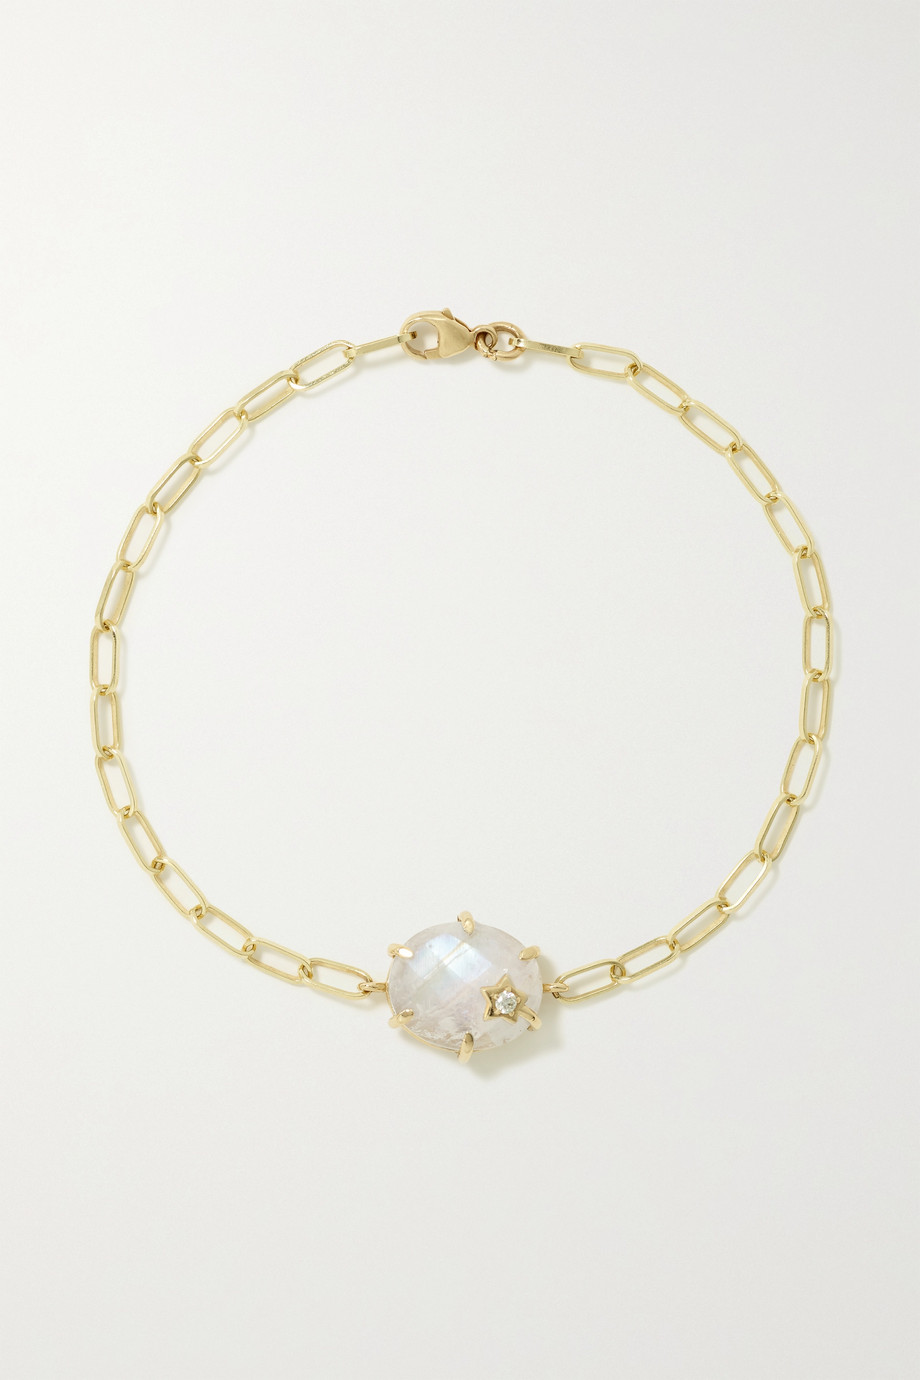 Andrea Fohrman Mini Galaxy 14-karat gold, moonstone and diamond bracelet